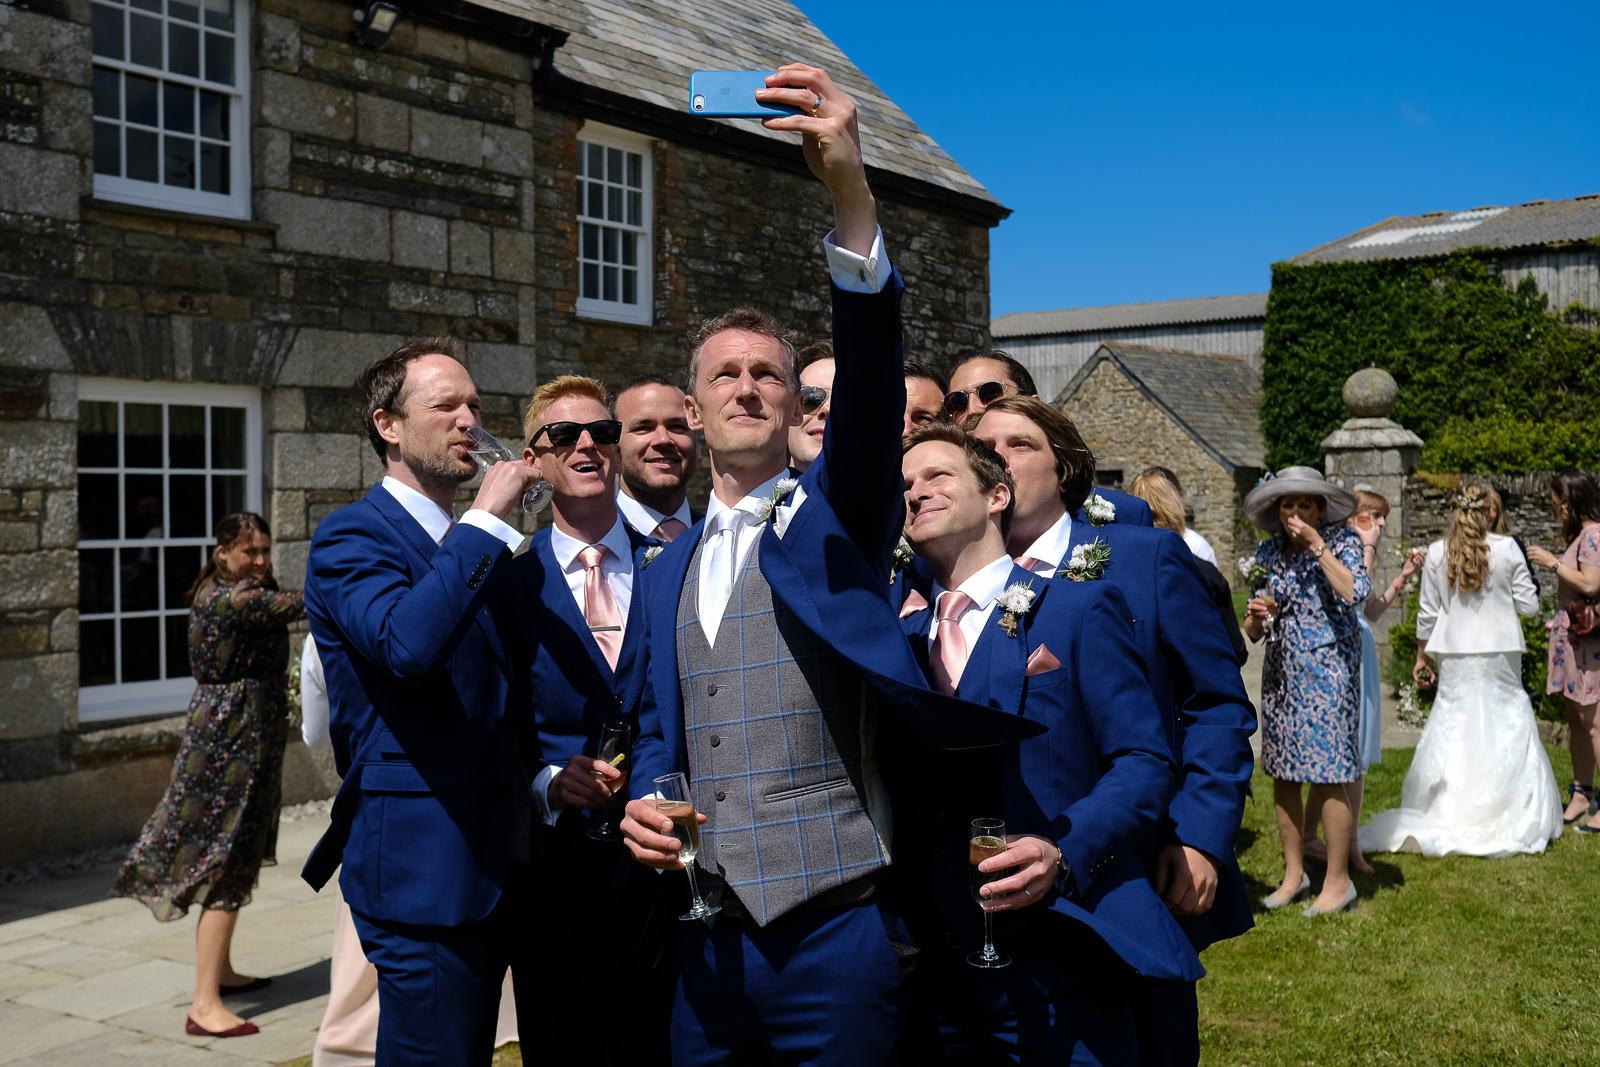 Roscarrock Farm wedding in Cornwall 048.jpg